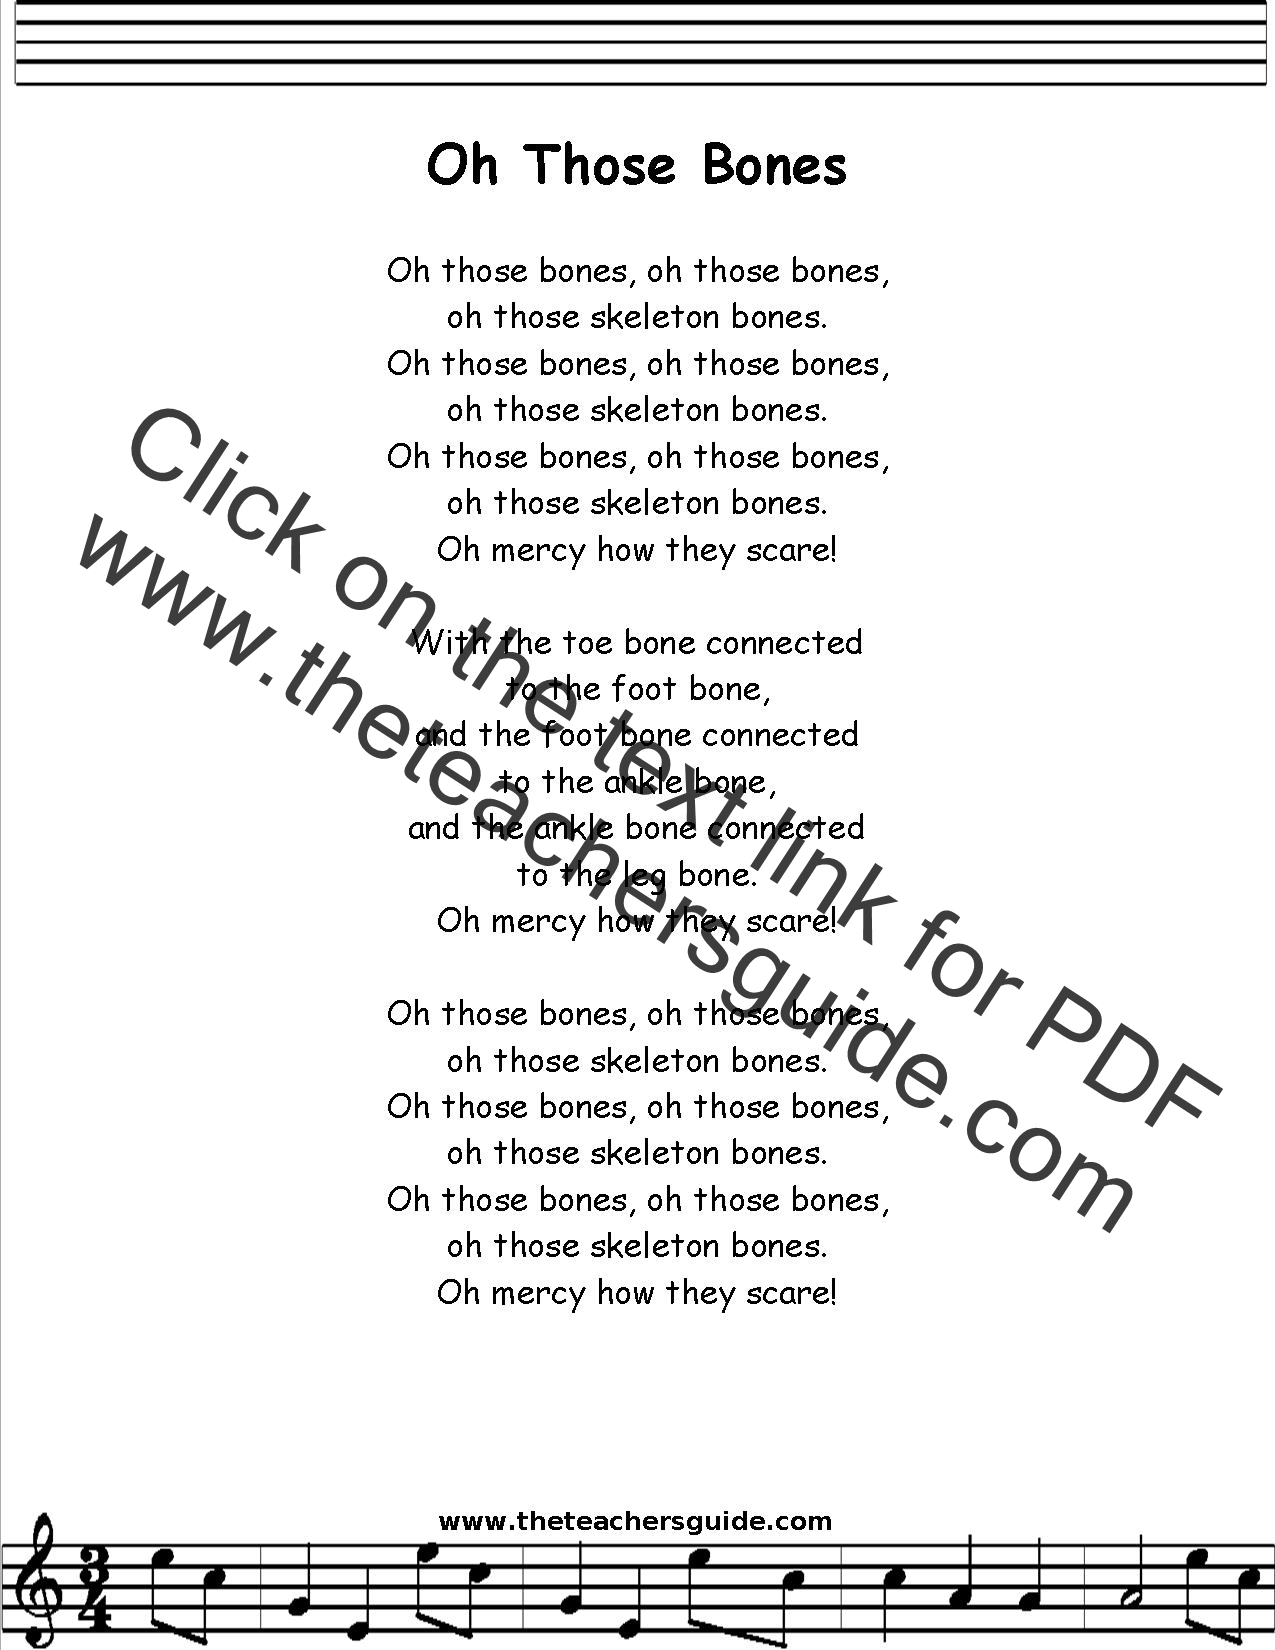 Oh Those Bones Dry Bones Lyrics Printout Midi And Video